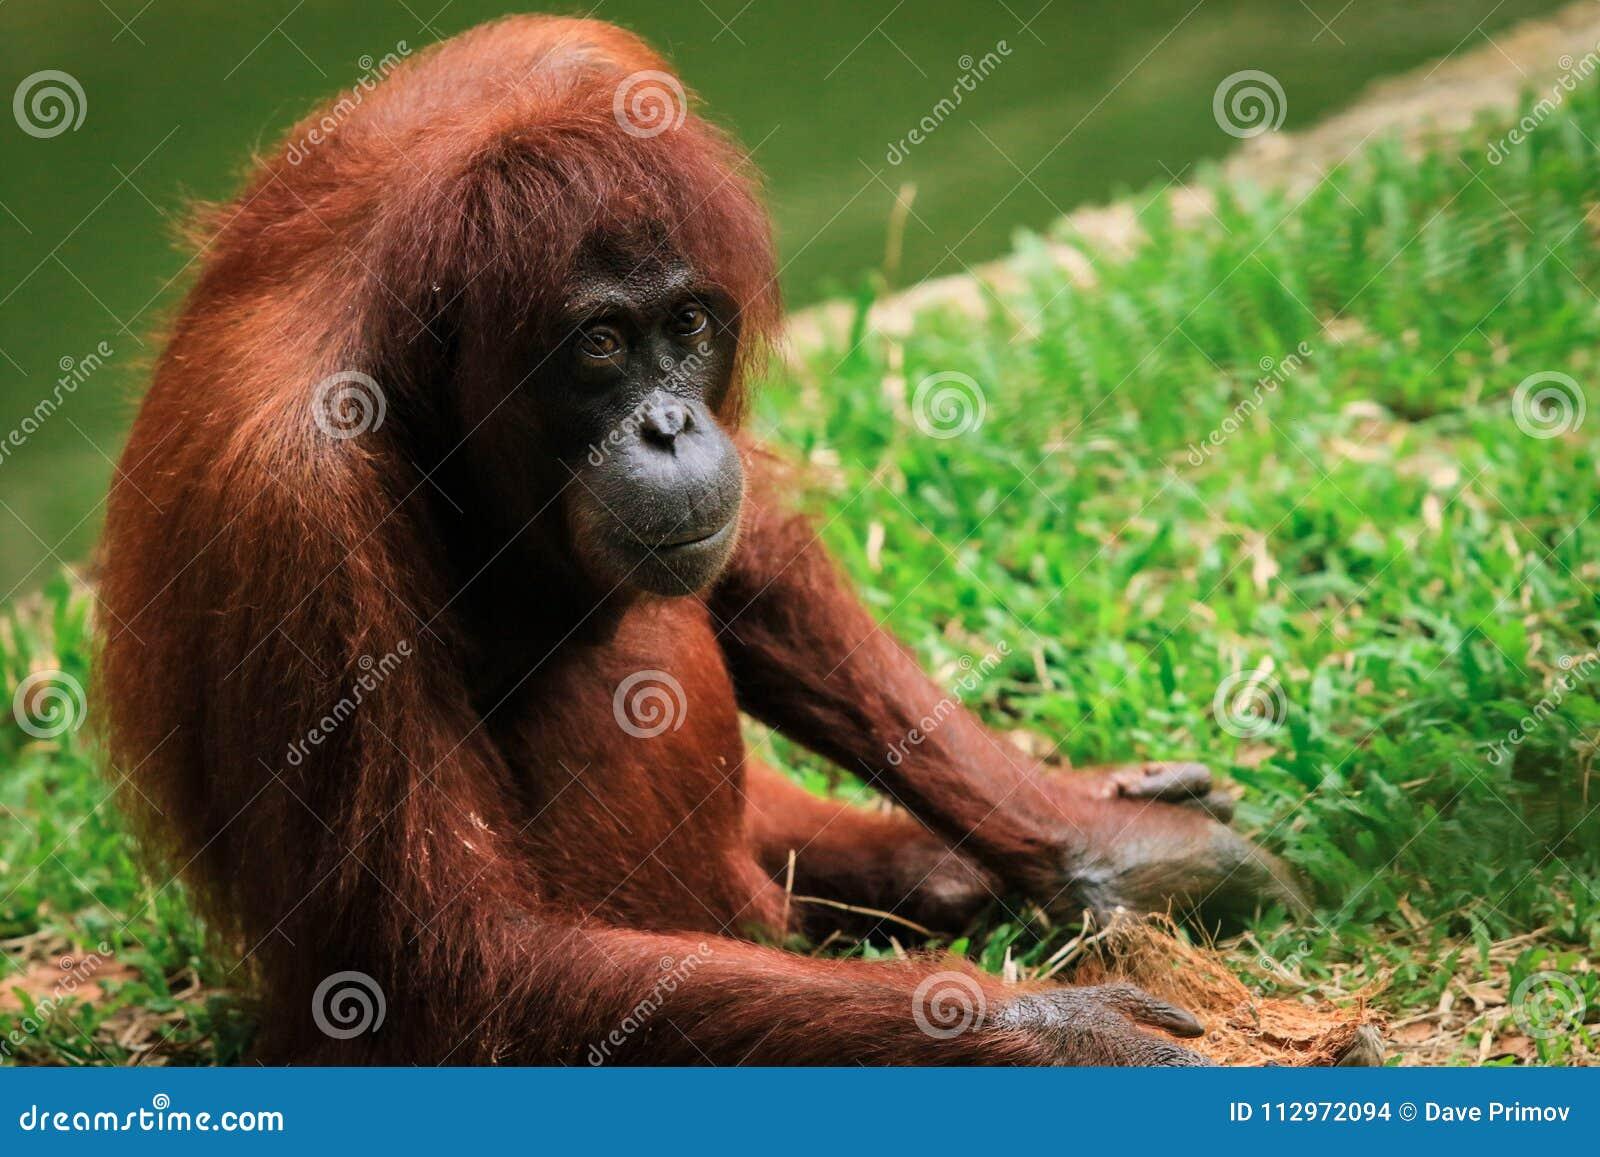 Зоопарк орангутана в Kota Kinabalu, Малайзии, Борнео